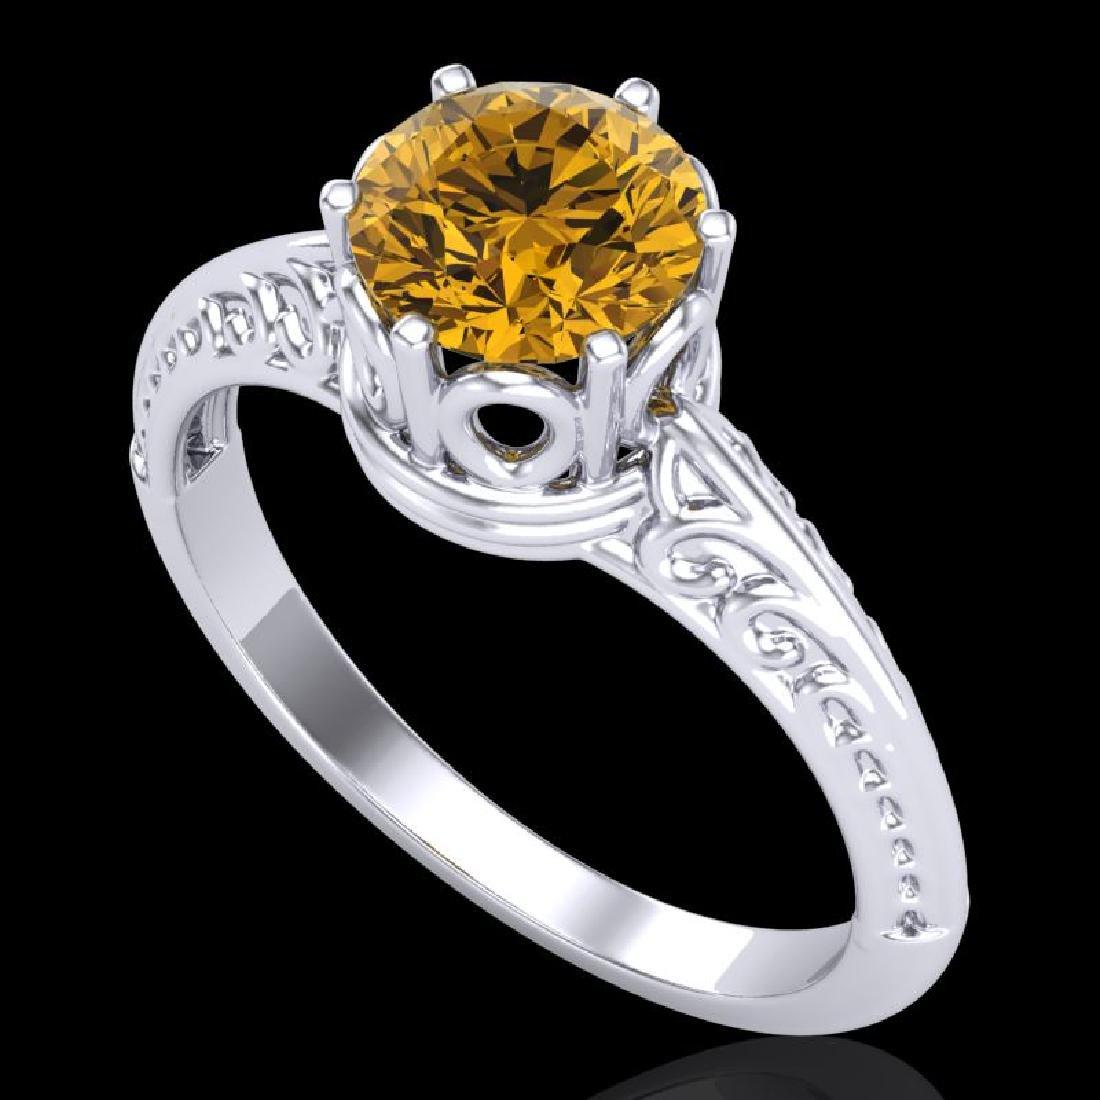 1 CTW Intense Yellow Diamond Solitaire Engagement Art